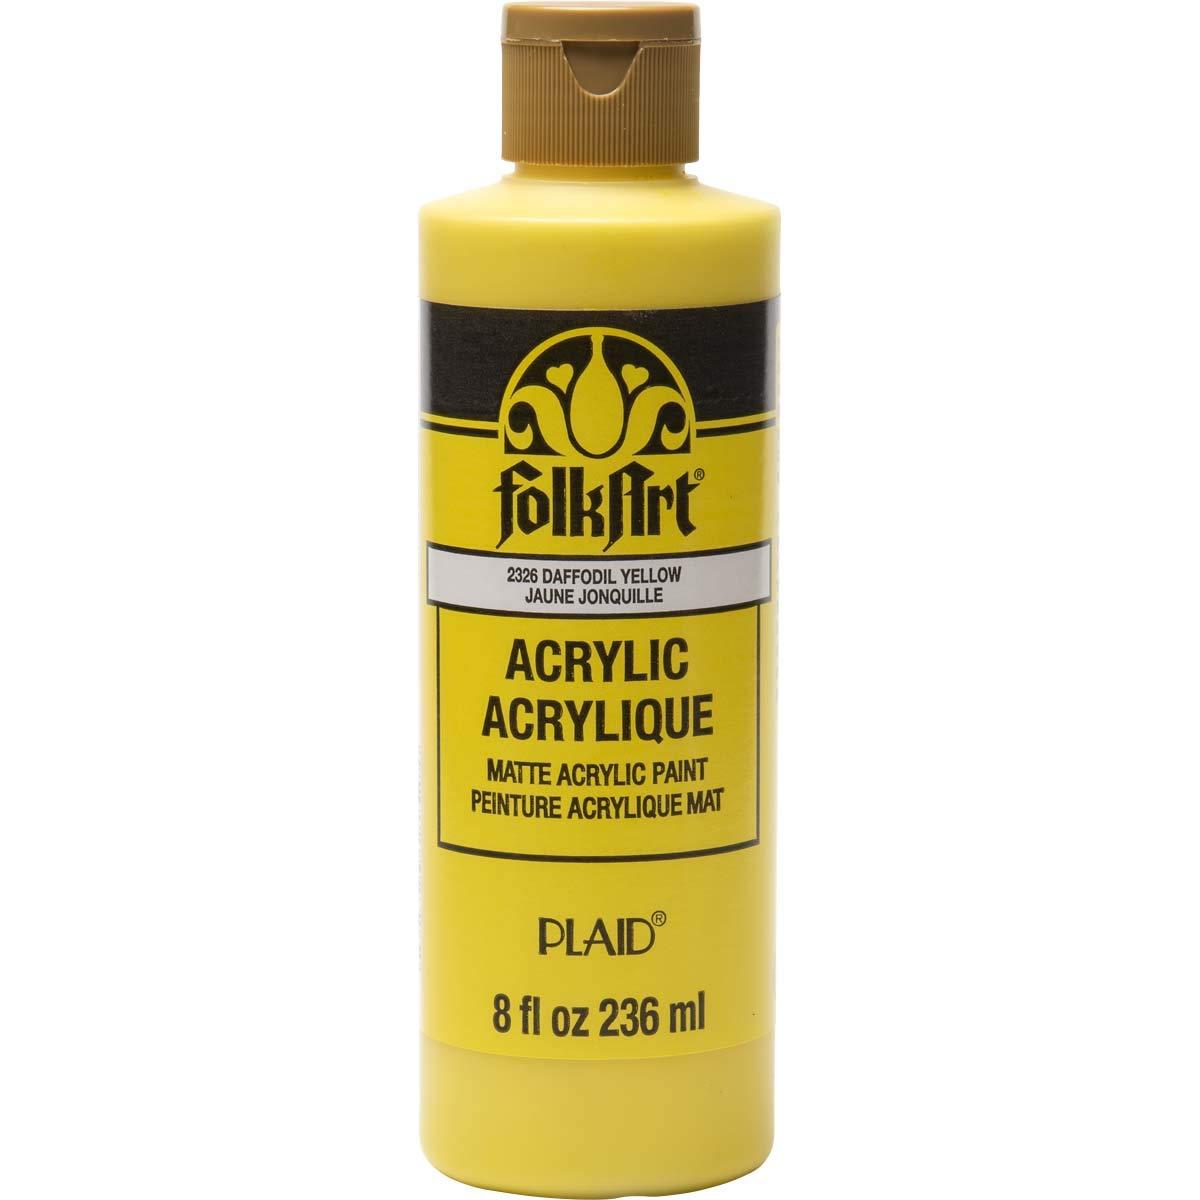 FolkArt 2326 Acrylic Paint, 8oz, Daffodil Yellow